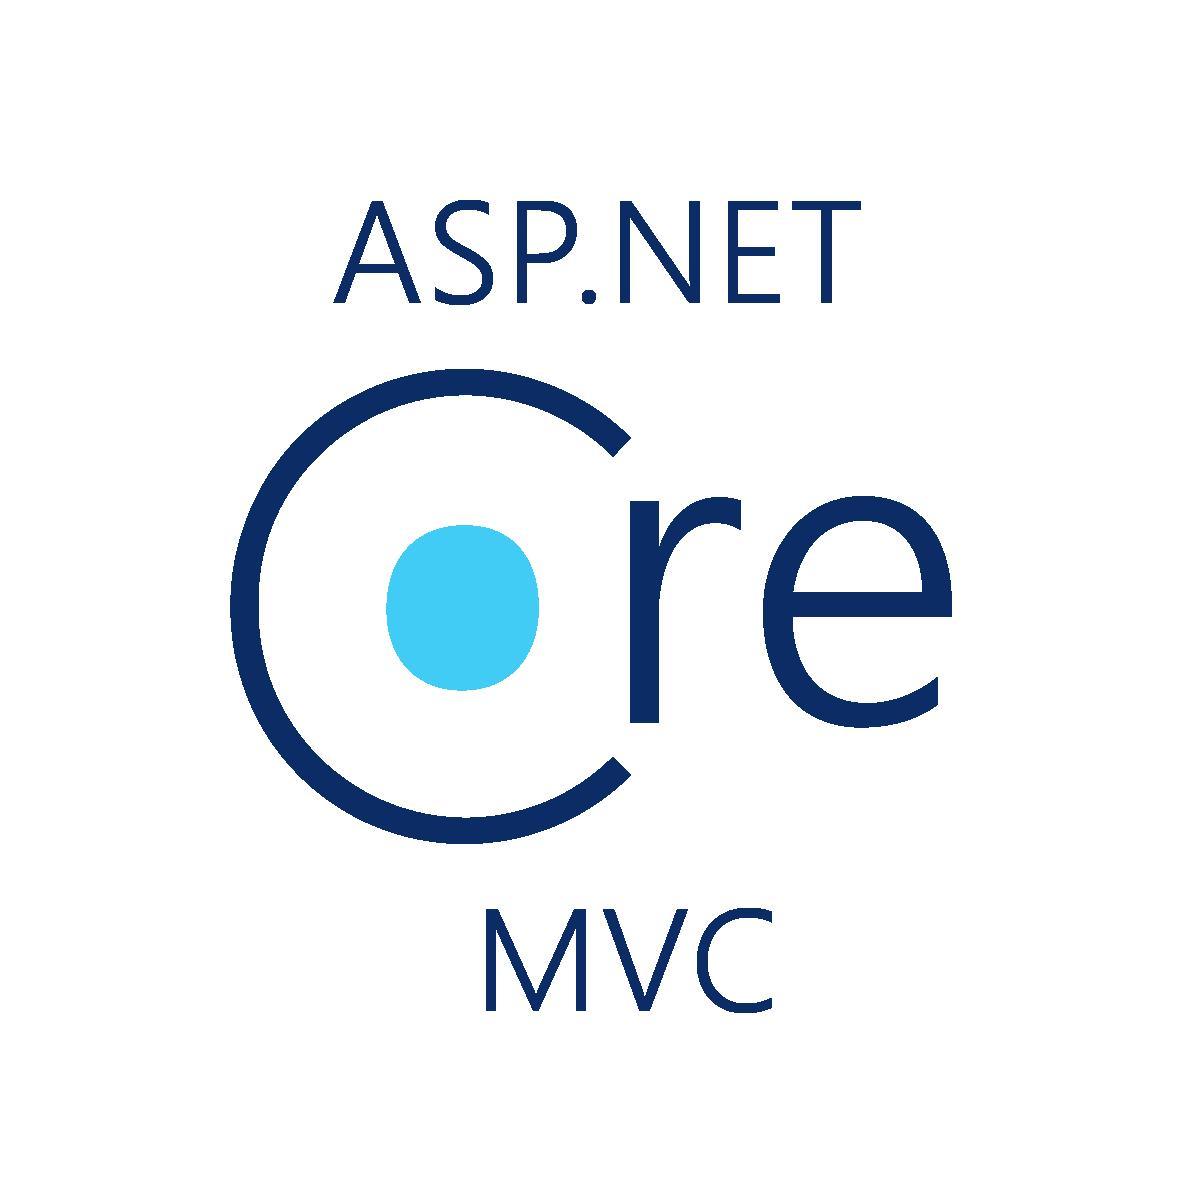 https://raw.githubusercontent.com/campusMVP/dotnetCoreLogoPack/master/ASP.NET%20Core%20MVC/Bitmap%20RGB/Bitmap-BIG_ASP.NET-Core-MVC-Logo_2colors_Square_RGB.png